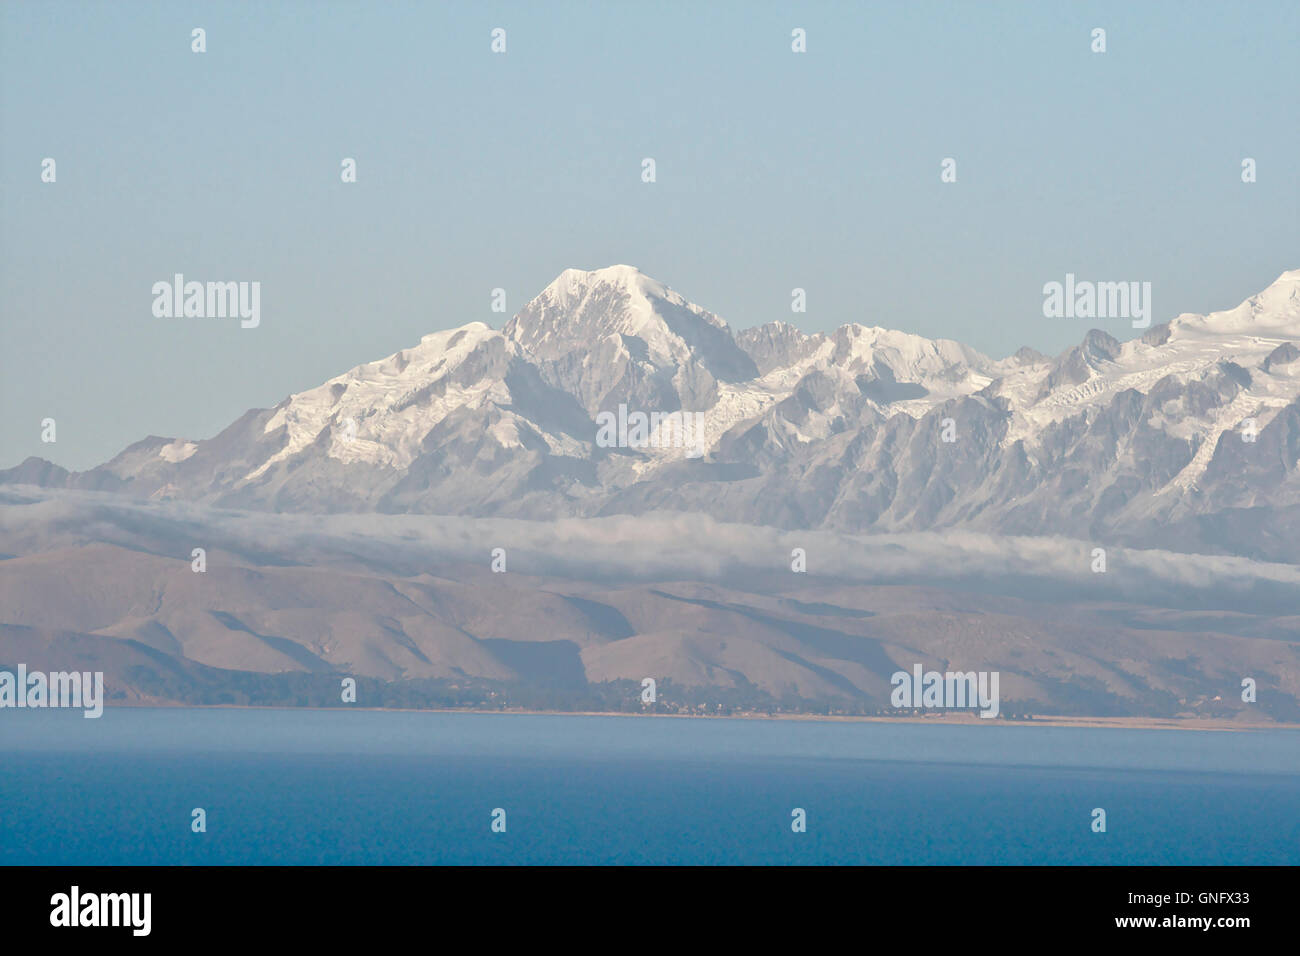 Titicaca Lake with Illampu, Cordillera Real, Bolivia - Stock Image